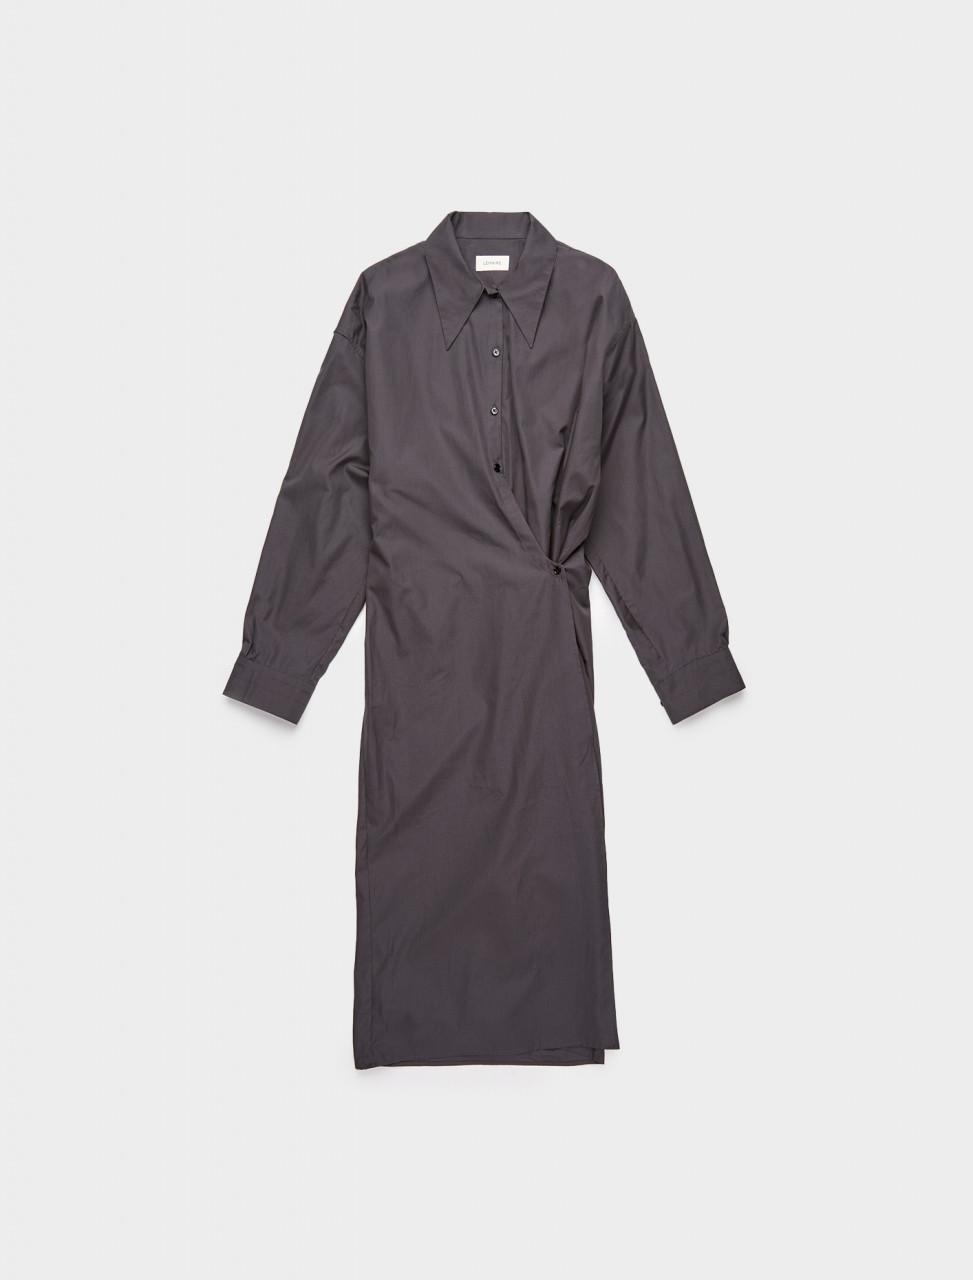 218-W-203-DR254-LF353-968 LEMAIRE TWISTED DRESS DARK GREY